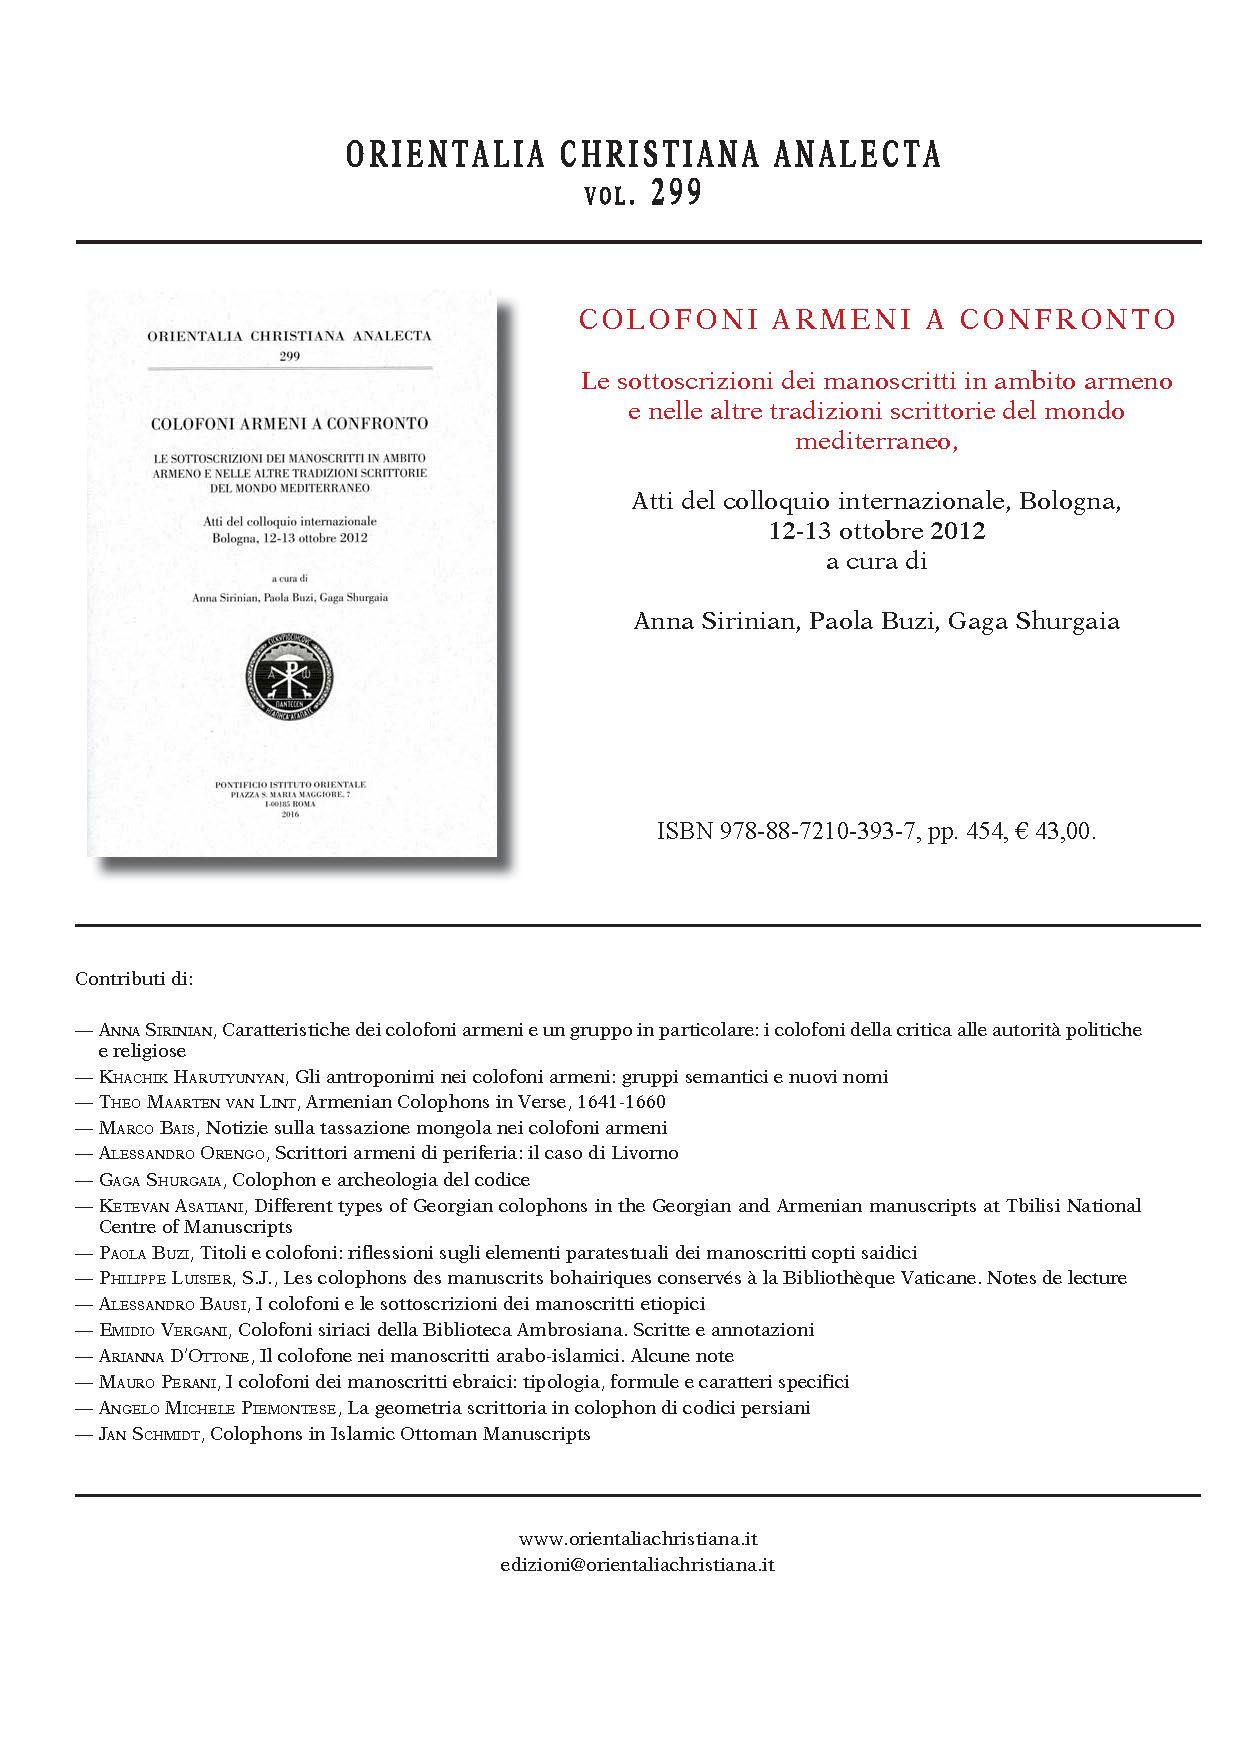 OCA 299 foglio informativo